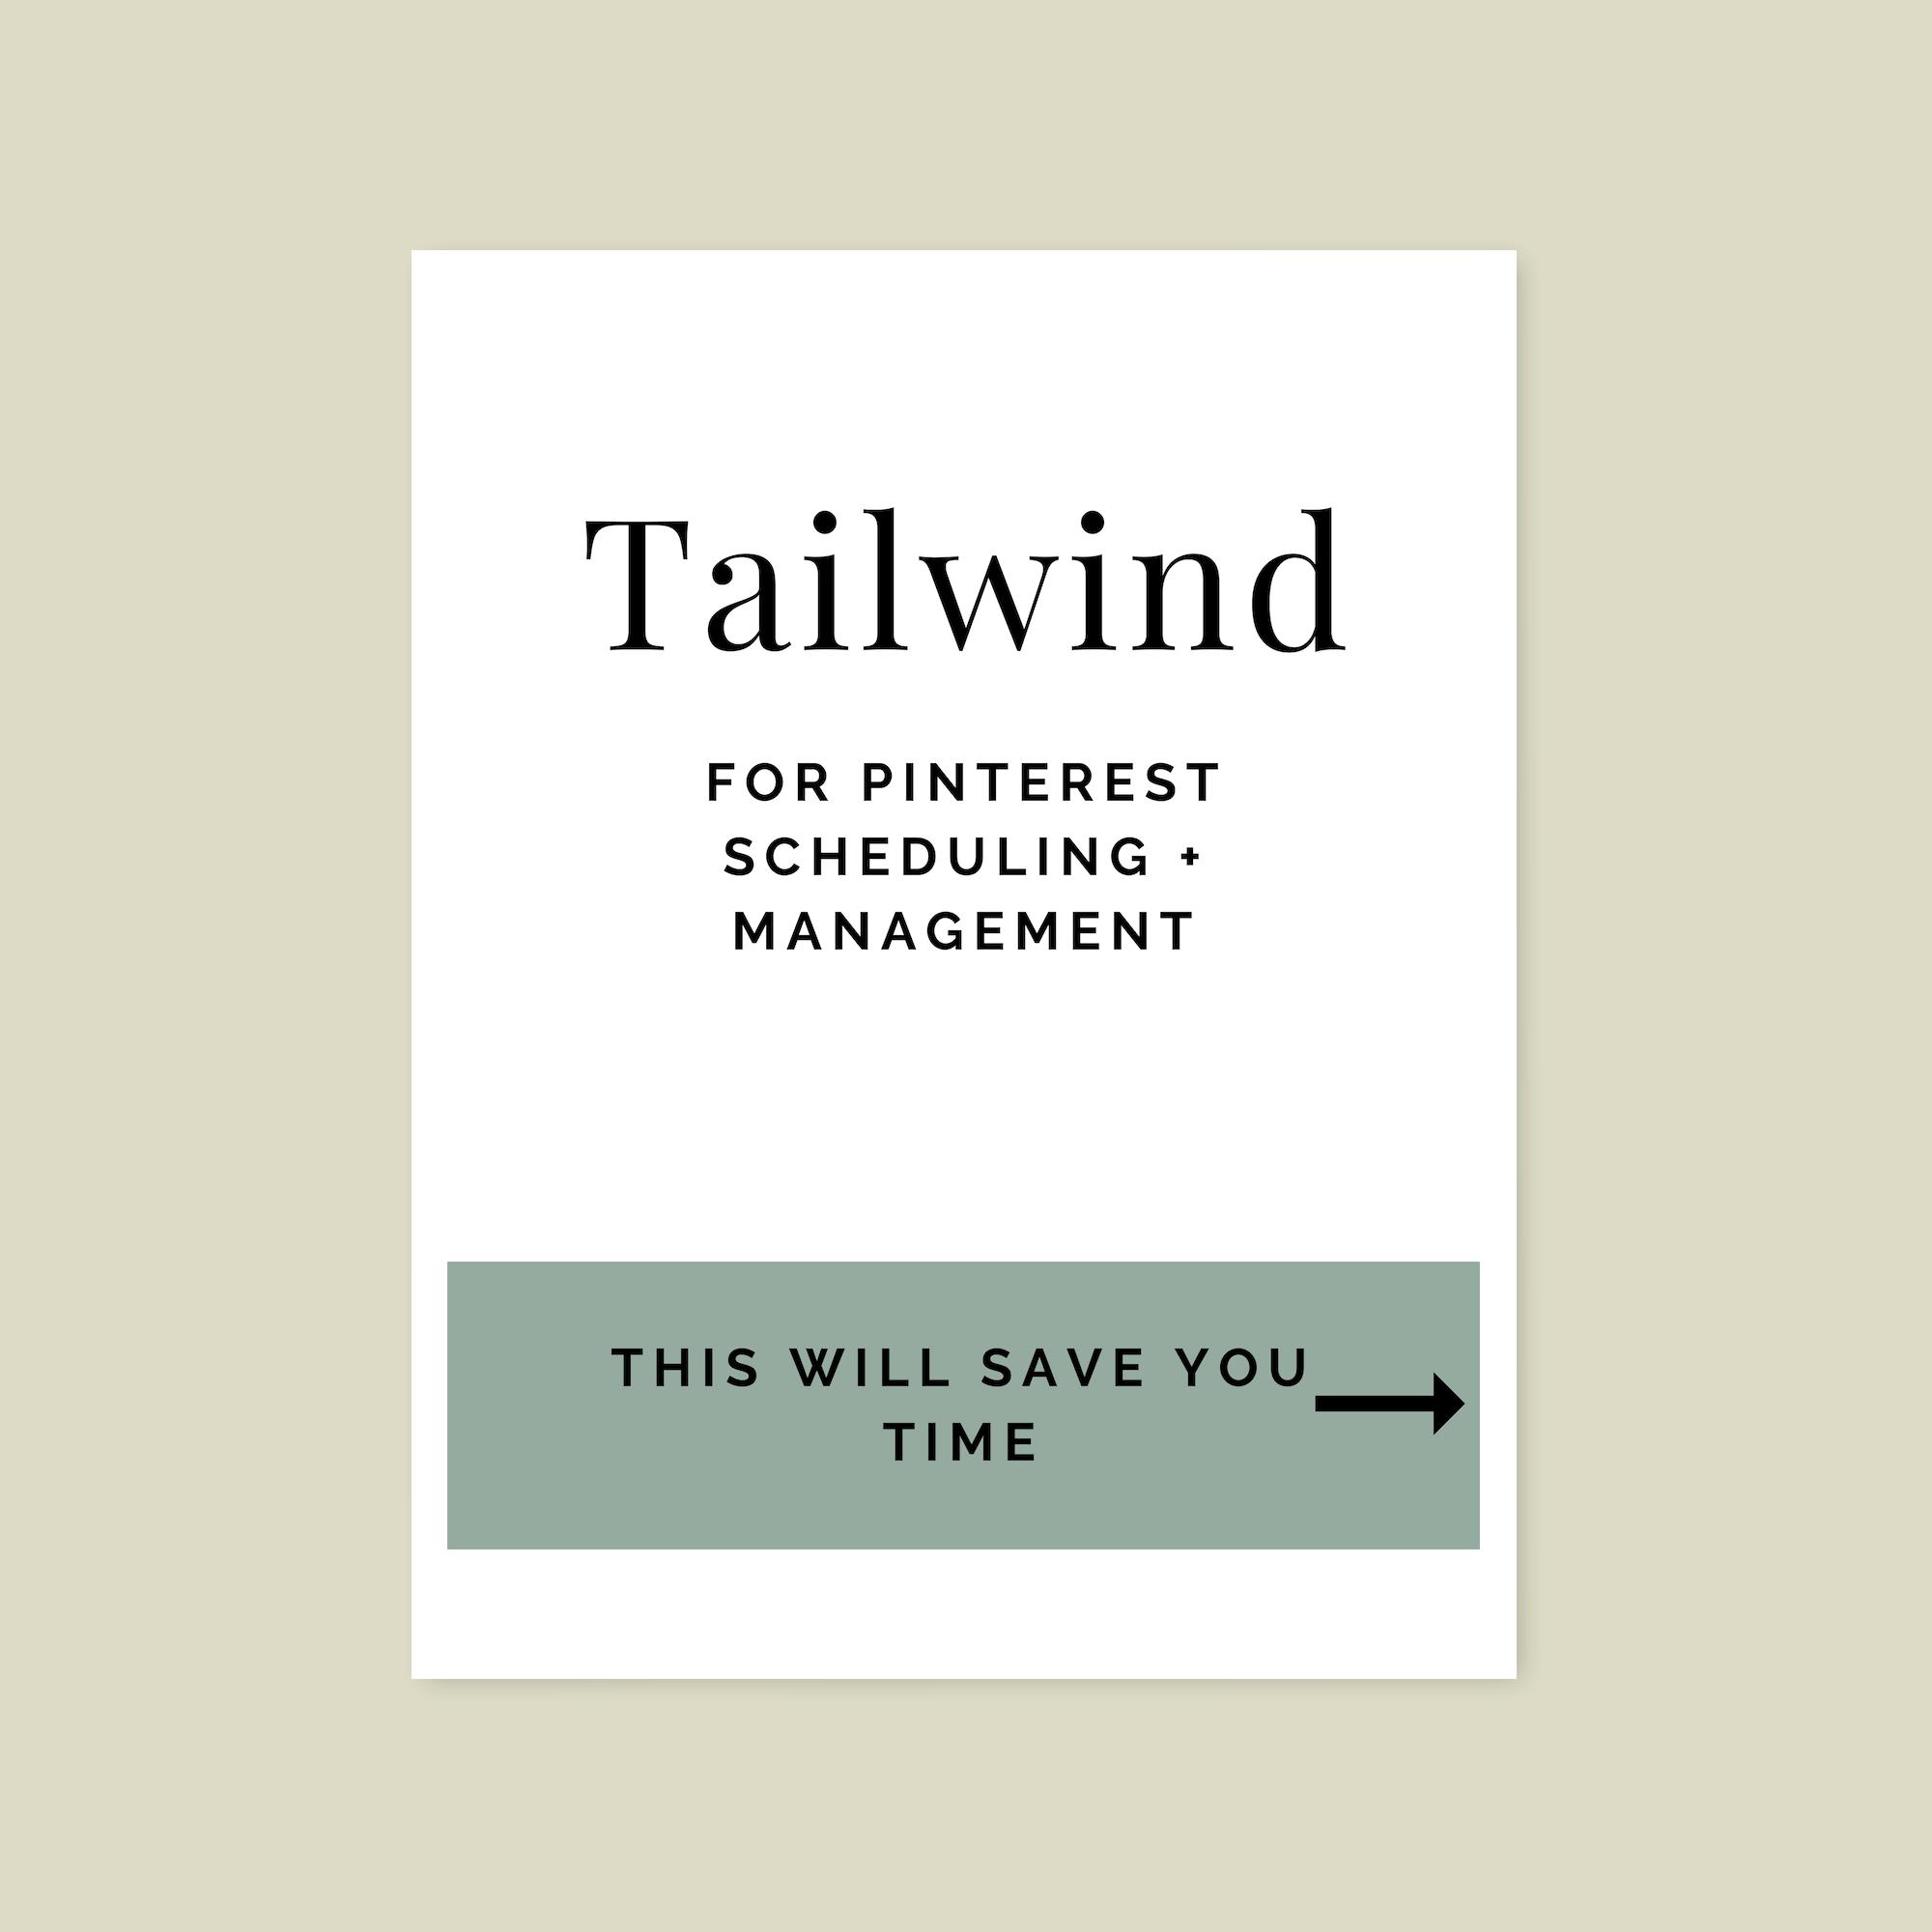 https://www.tailwindapp.com/i/withhannahmurphy